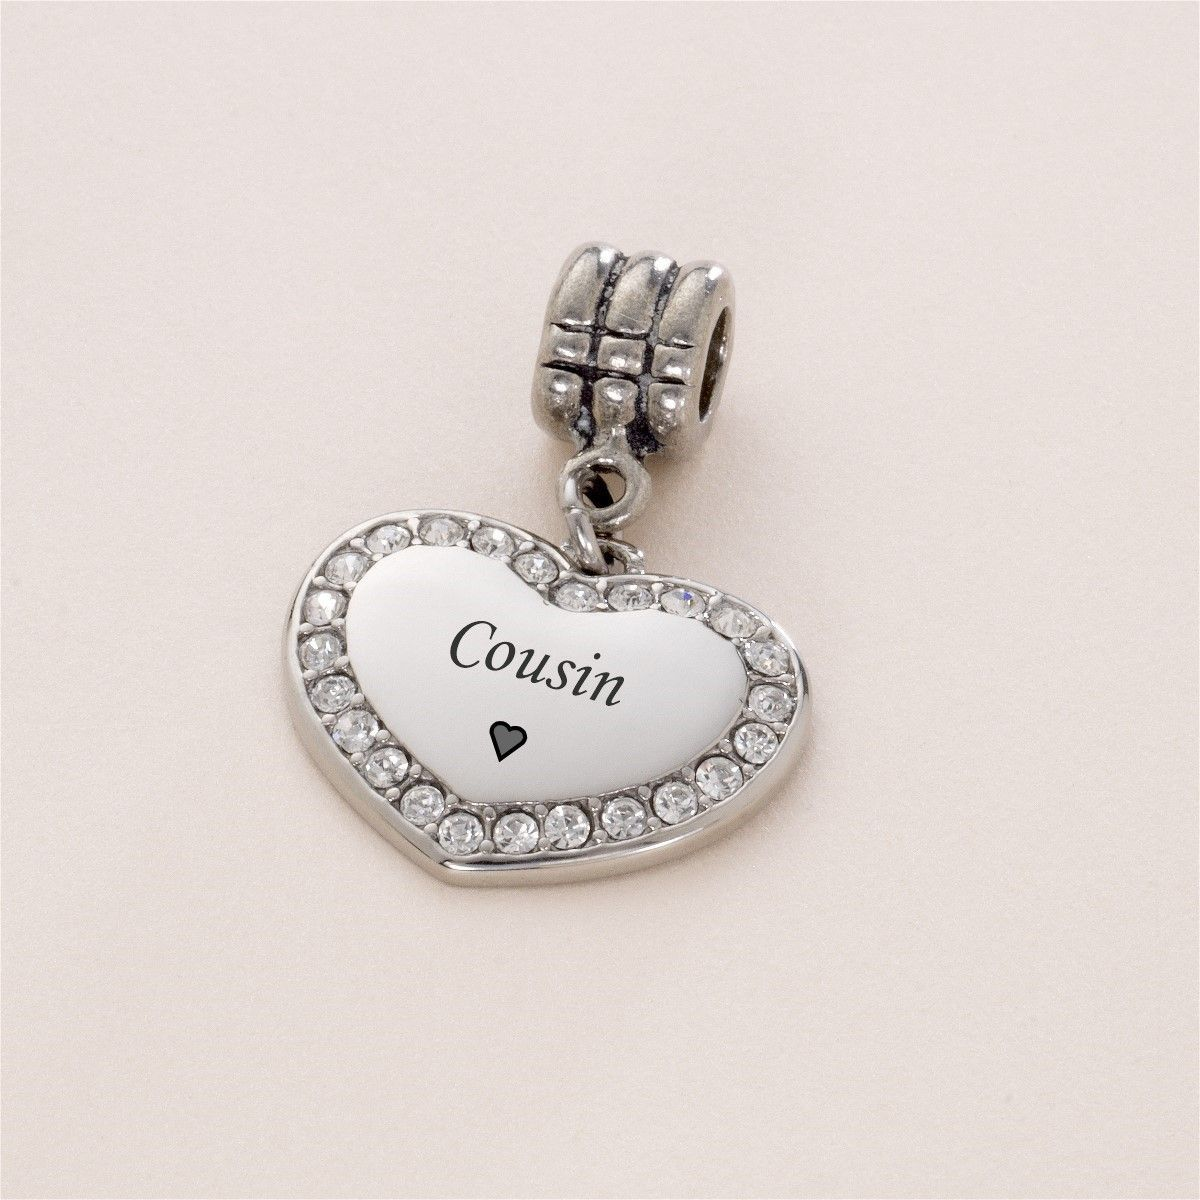 Cousin charm gift cousins Crystal Heart charm fits European bracelet//necklace